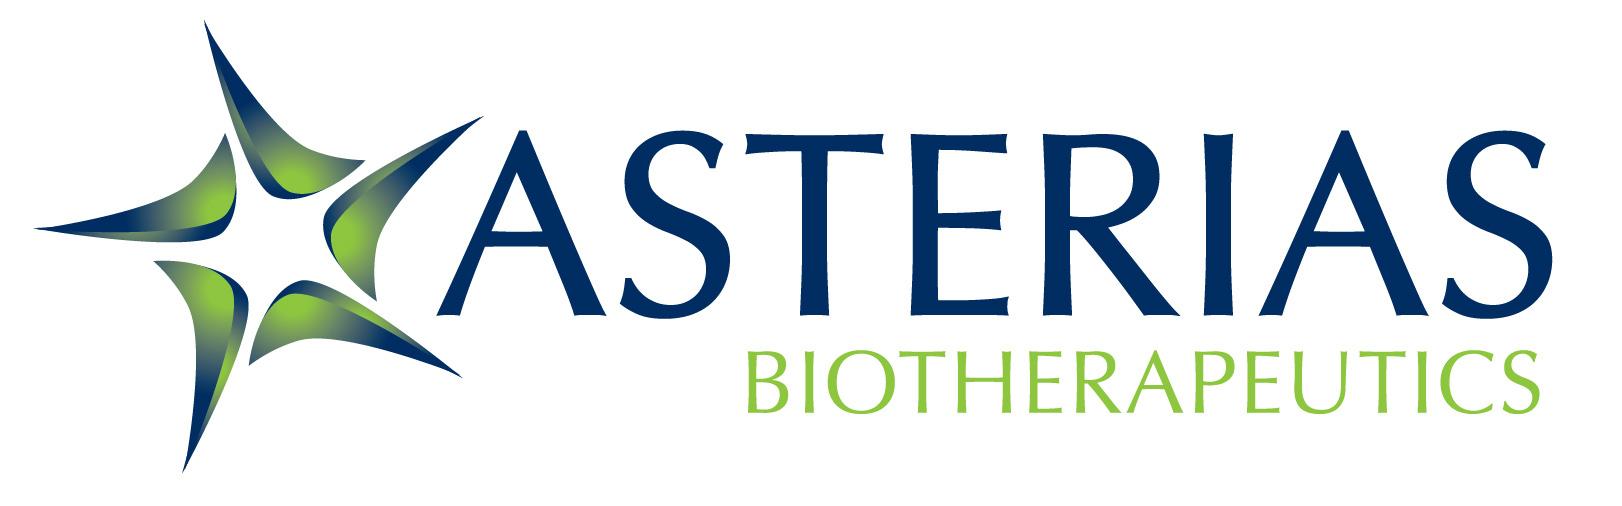 asterias-biotherapeutics-inc-ast-stock-rating-reaffirmed-by-hc-wainwright.jpg